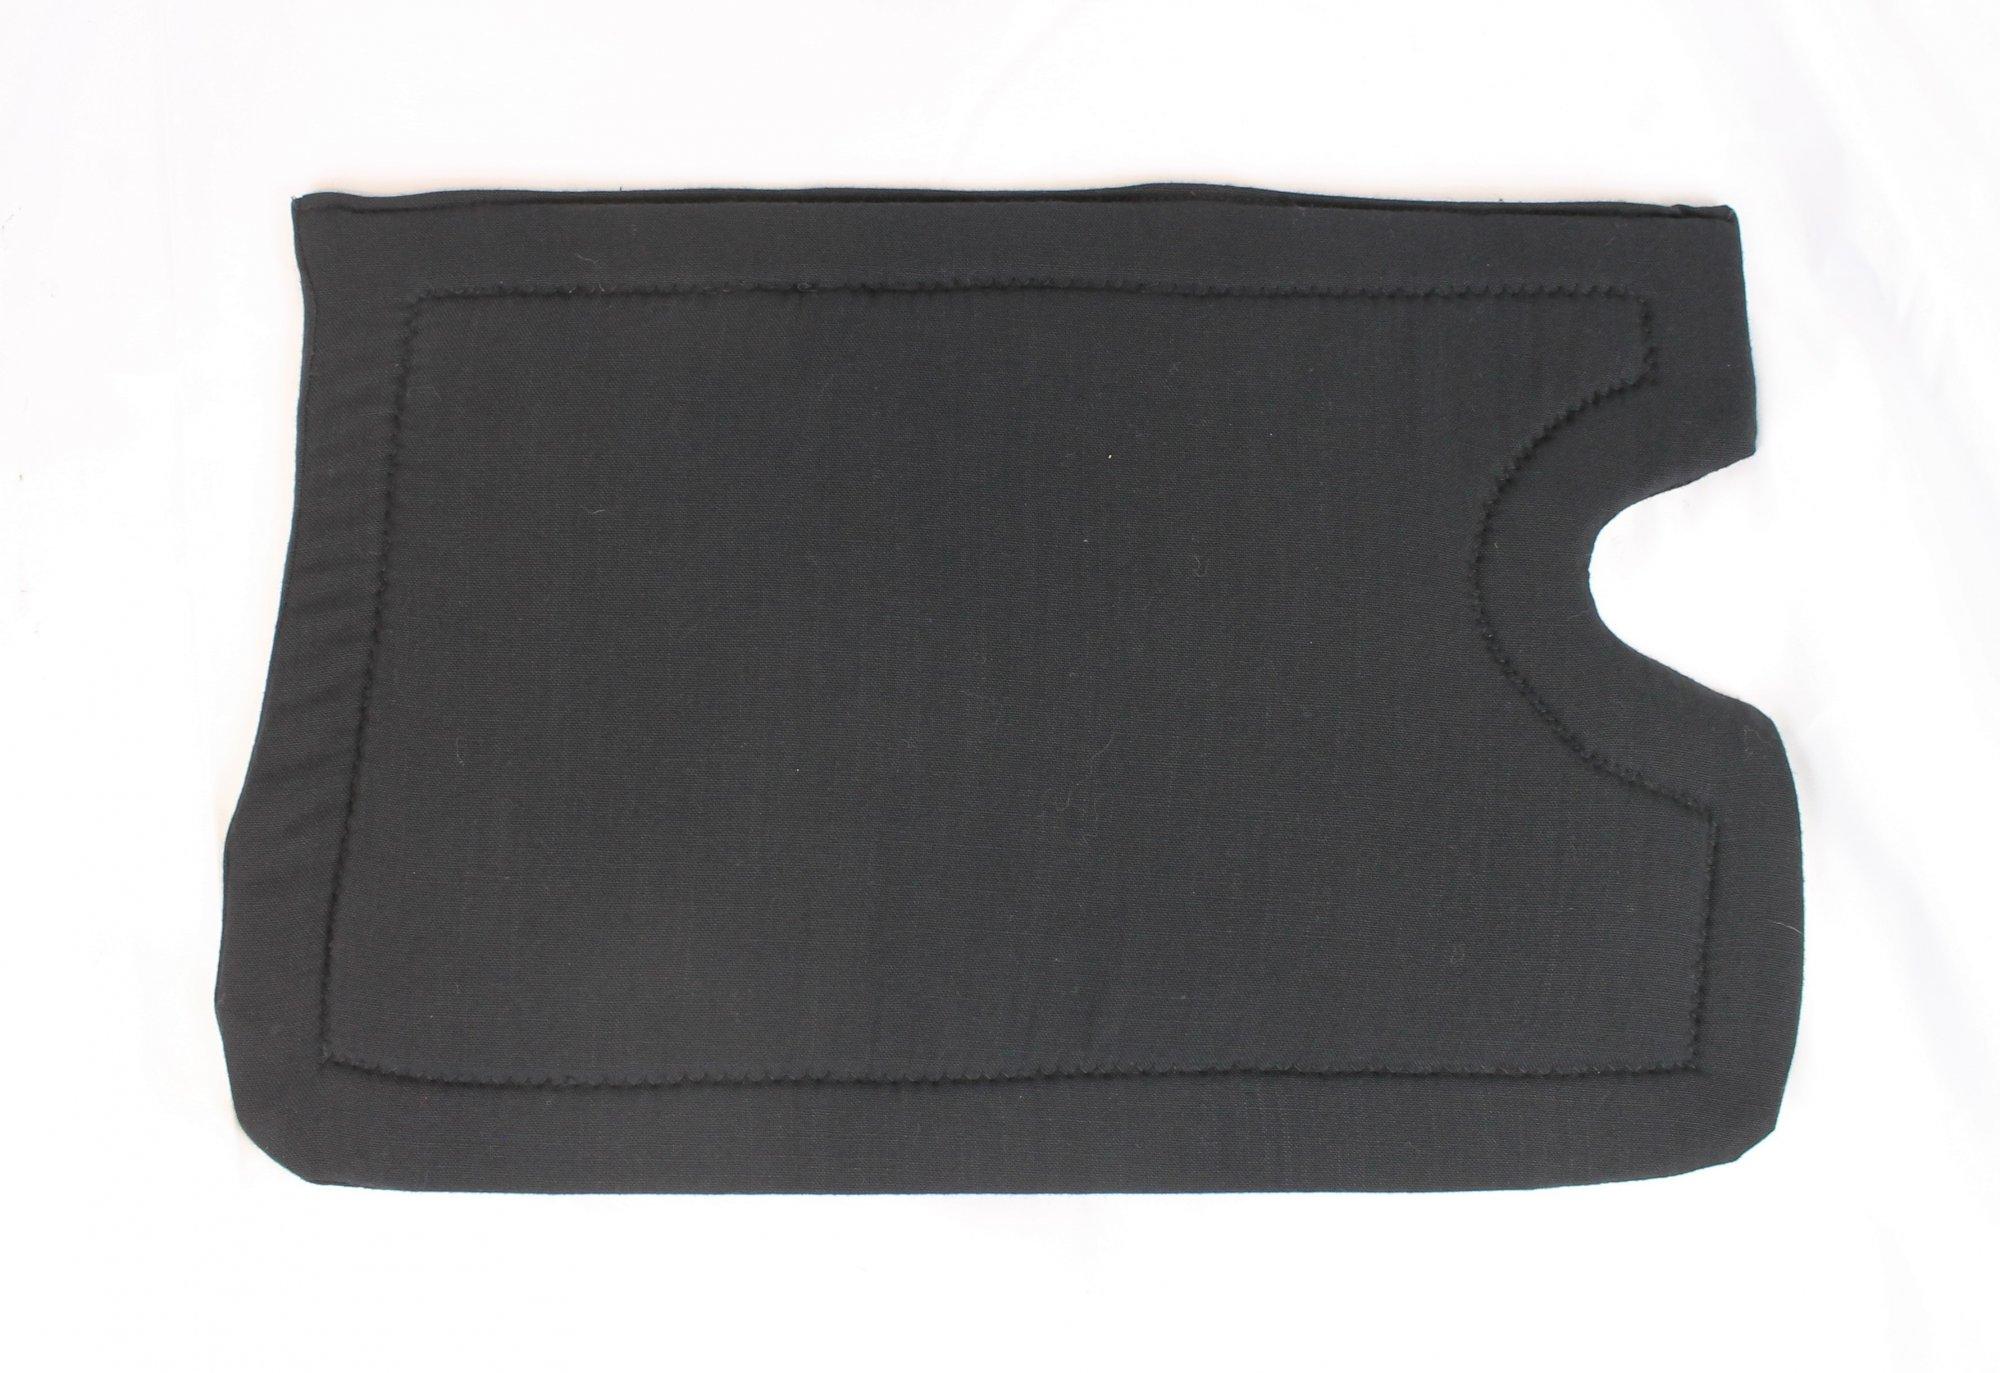 Black Nylon Cutout Accordion Back Pad Width (16.5in / 42cm) Length (10.5in / 27cm)